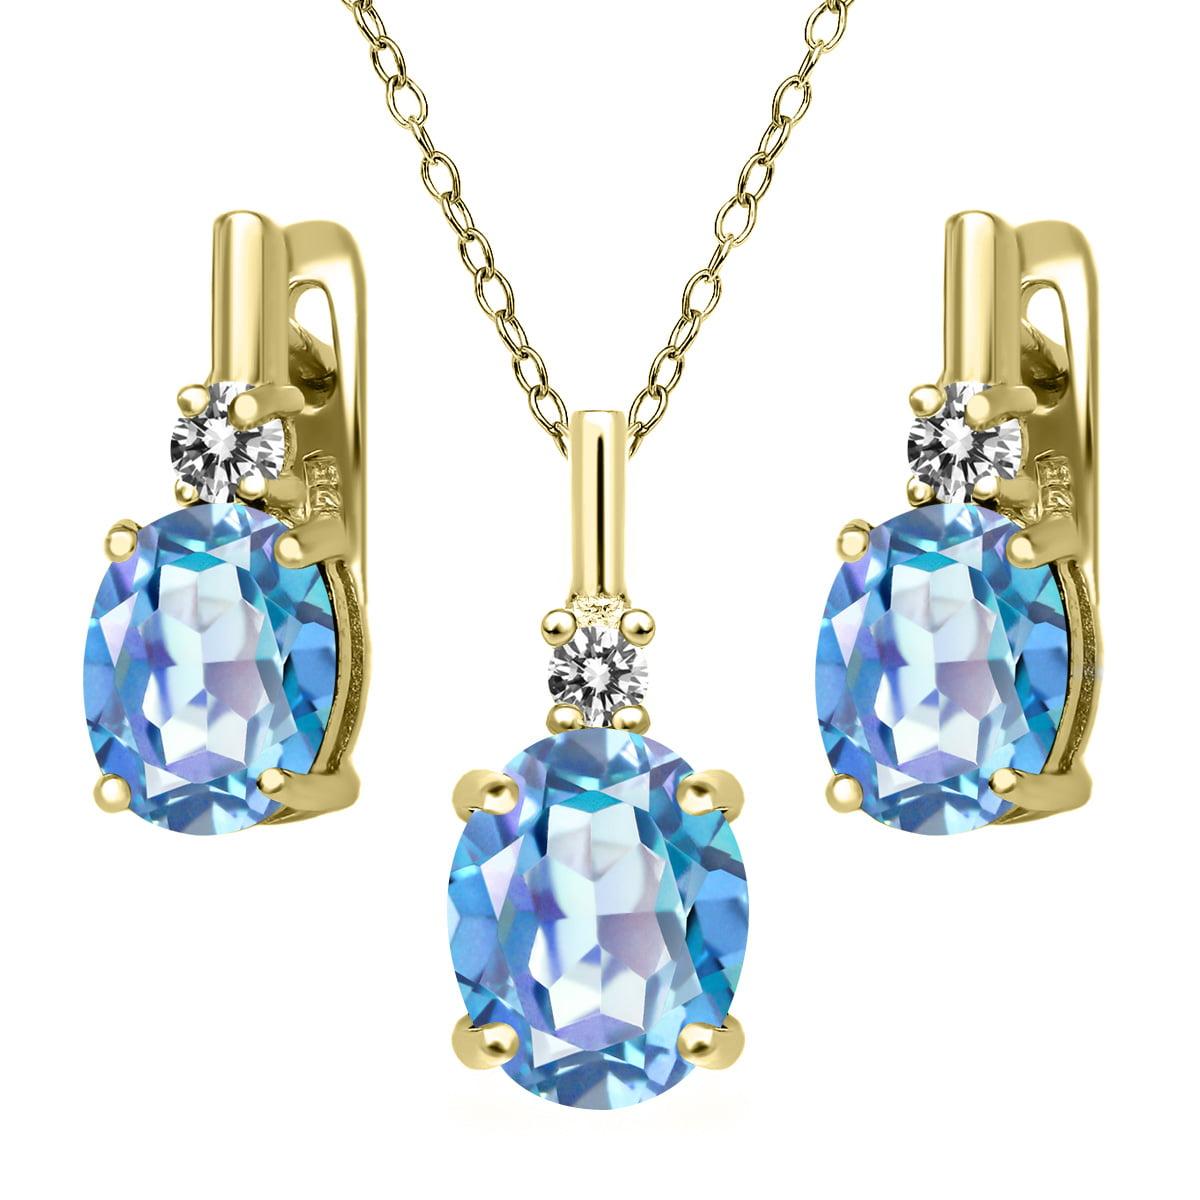 6.97 Ct Millennium Blue Mystic Quartz White Diamond 18K Yellow Gold Plated Silver Pendant Earrings Set by